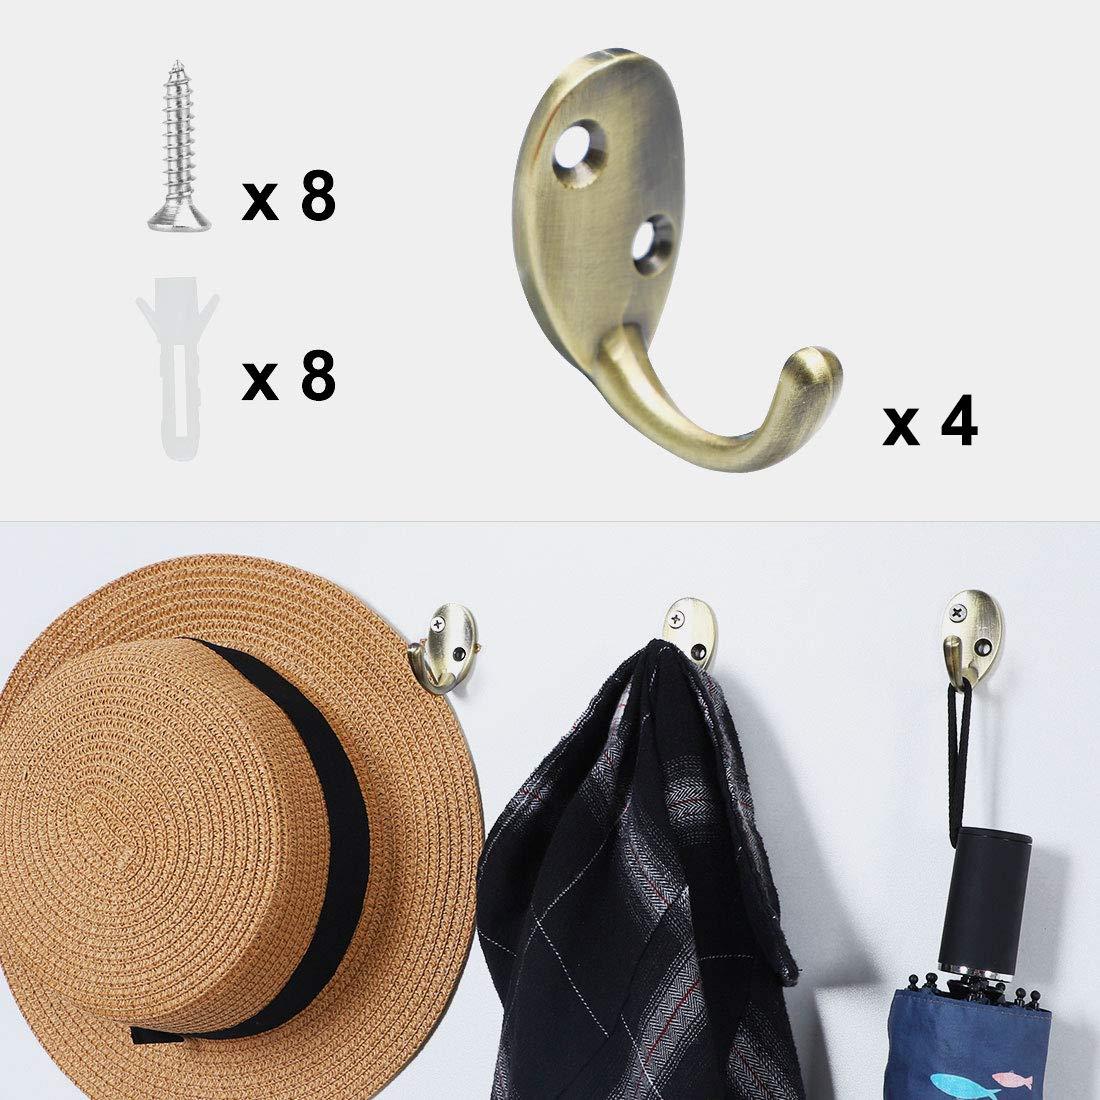 sourcing map 2pcs Wall Hook Zinc Alloy Wall Mounted Hooks Bag Coat Towel Clasp Bathroom Robe Hanger w Screws Copper Tone